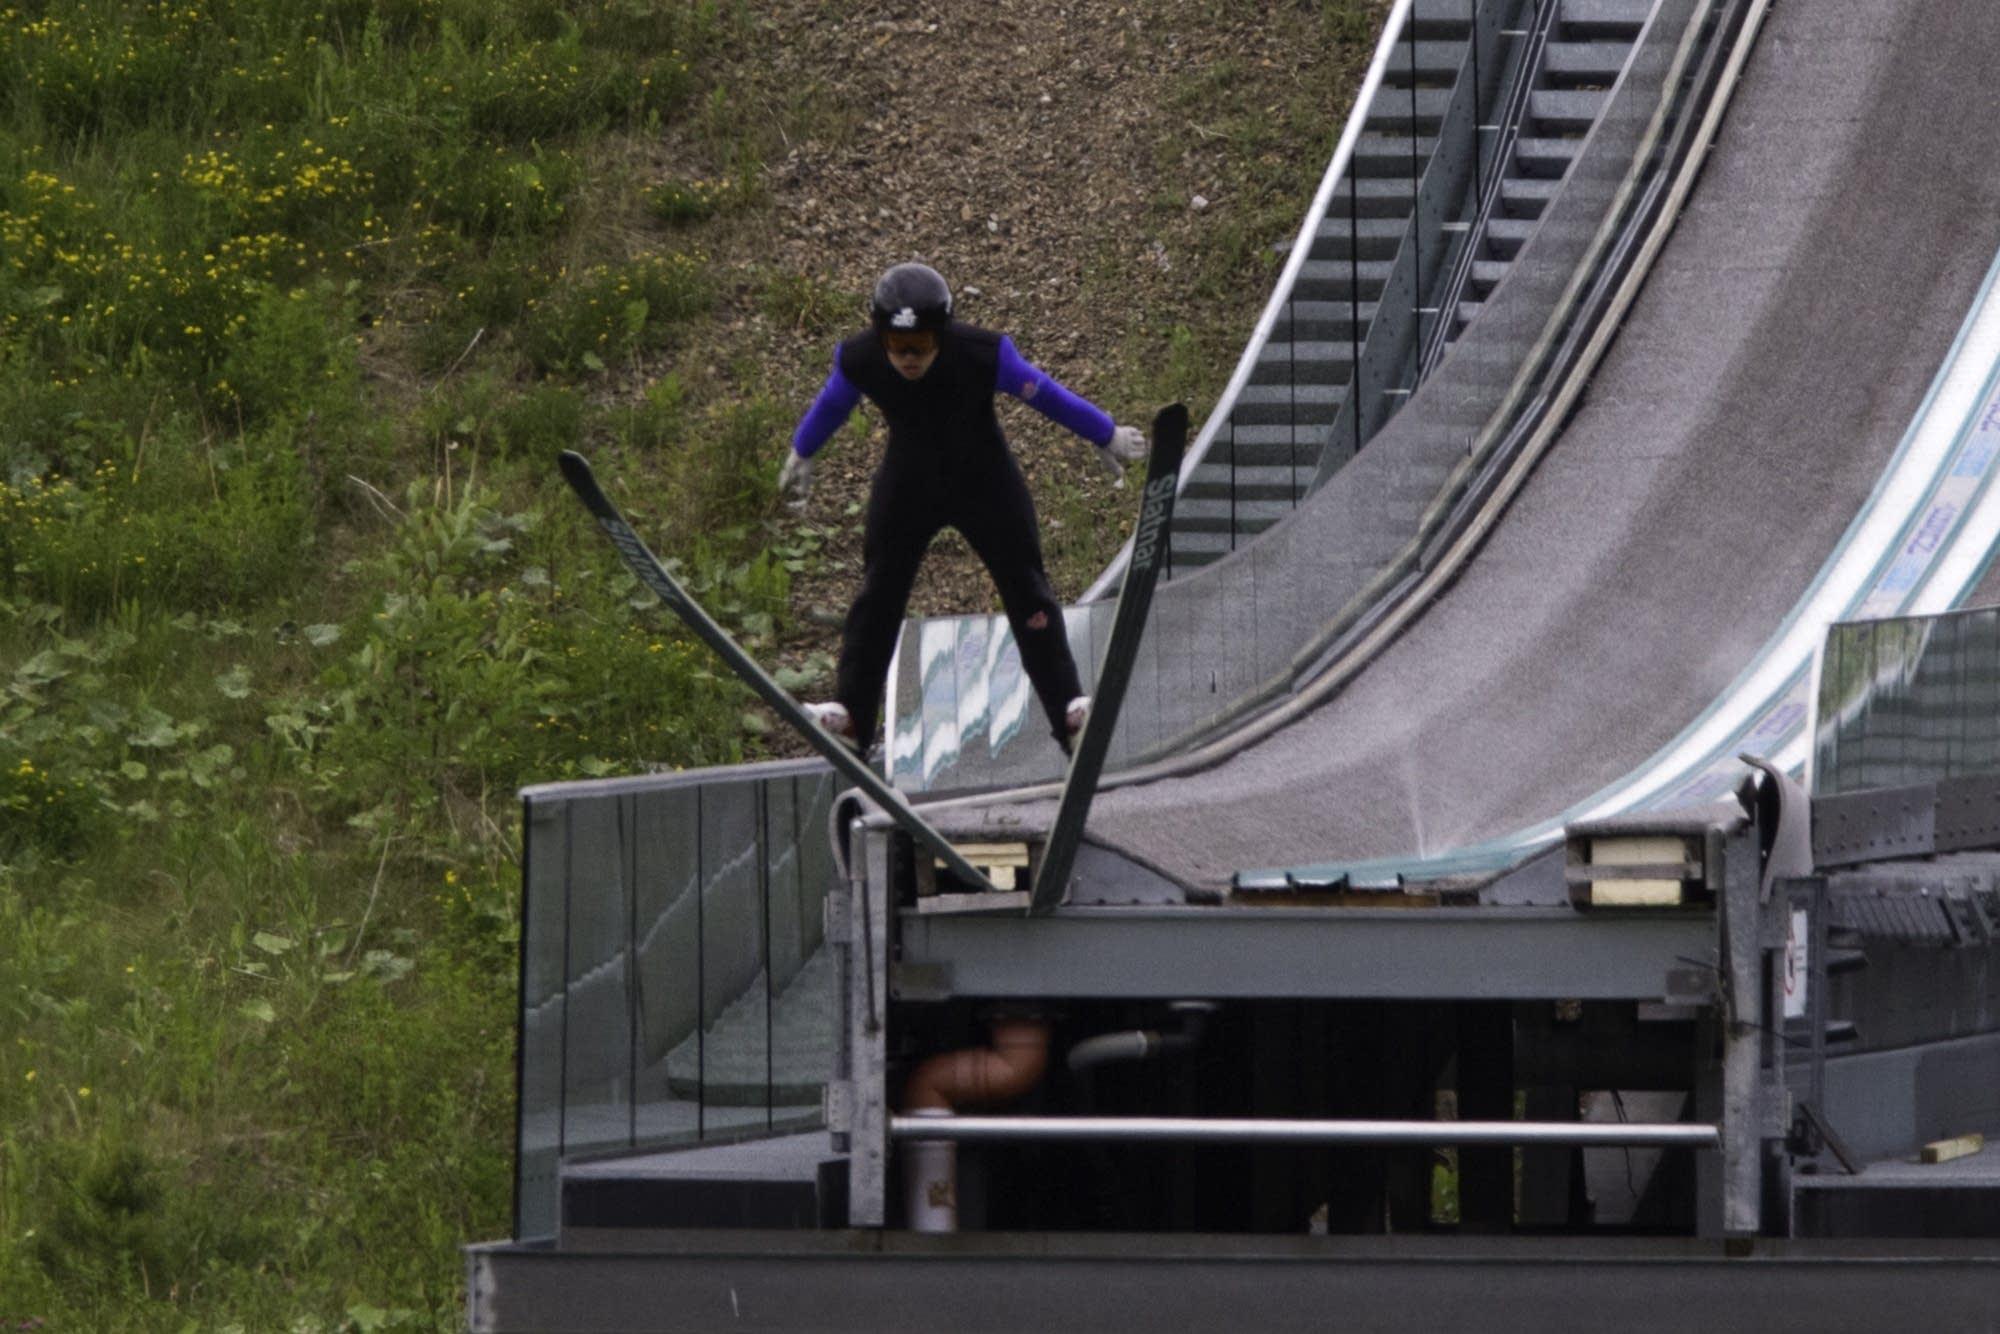 Oslo - 36 - ski jumper